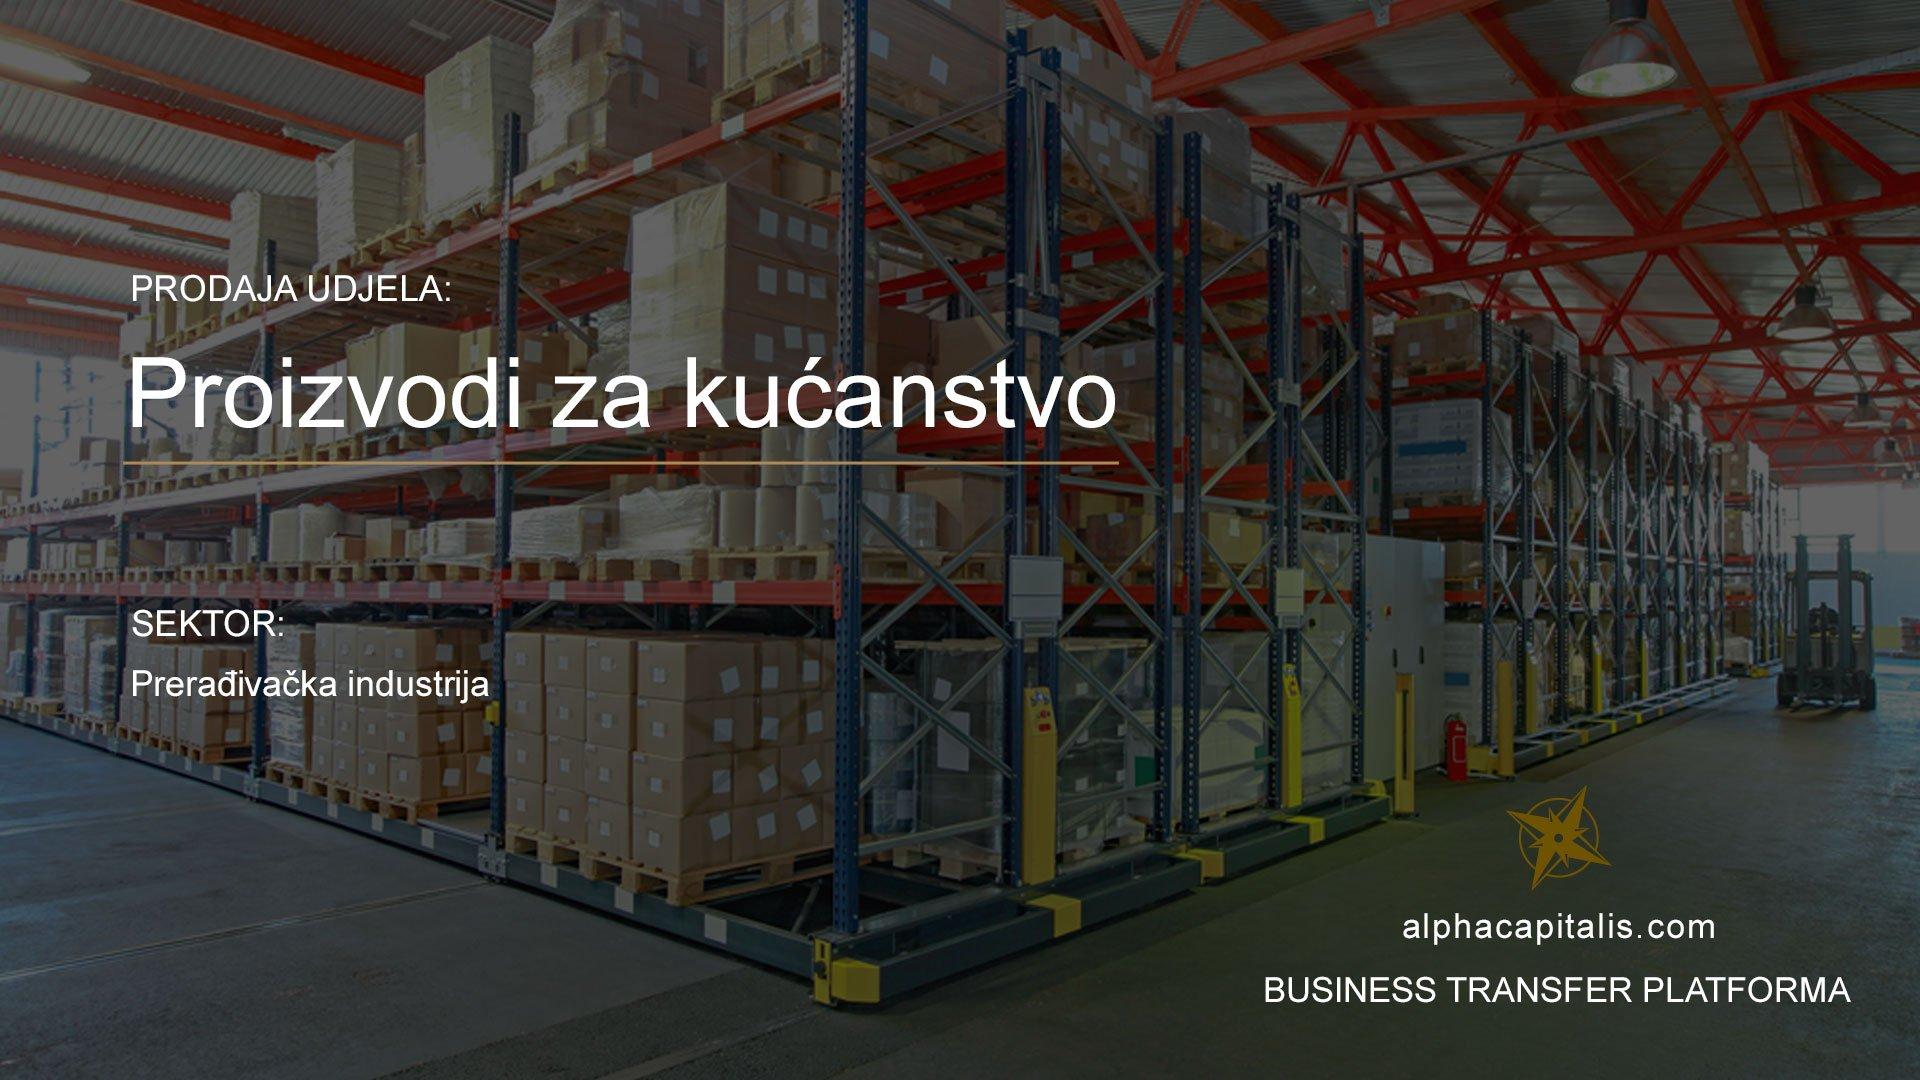 Alpha-capitalis-business-transfer-platforma